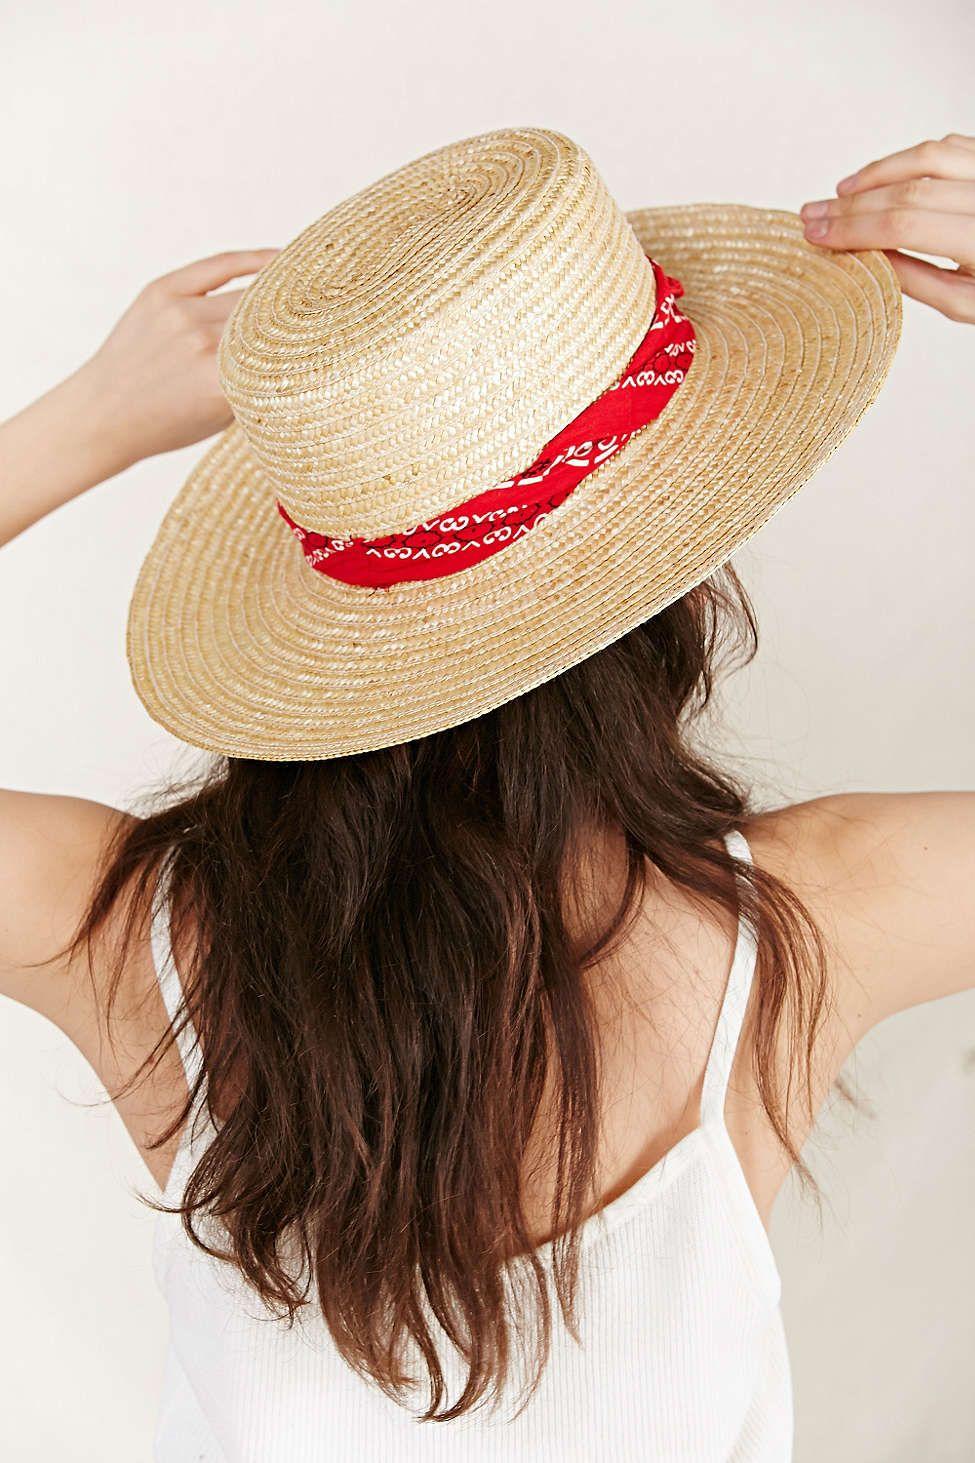 12c81a59 Urban Renewal Vintage Wide Brim Straw Hat | Accessorize | Hats ...